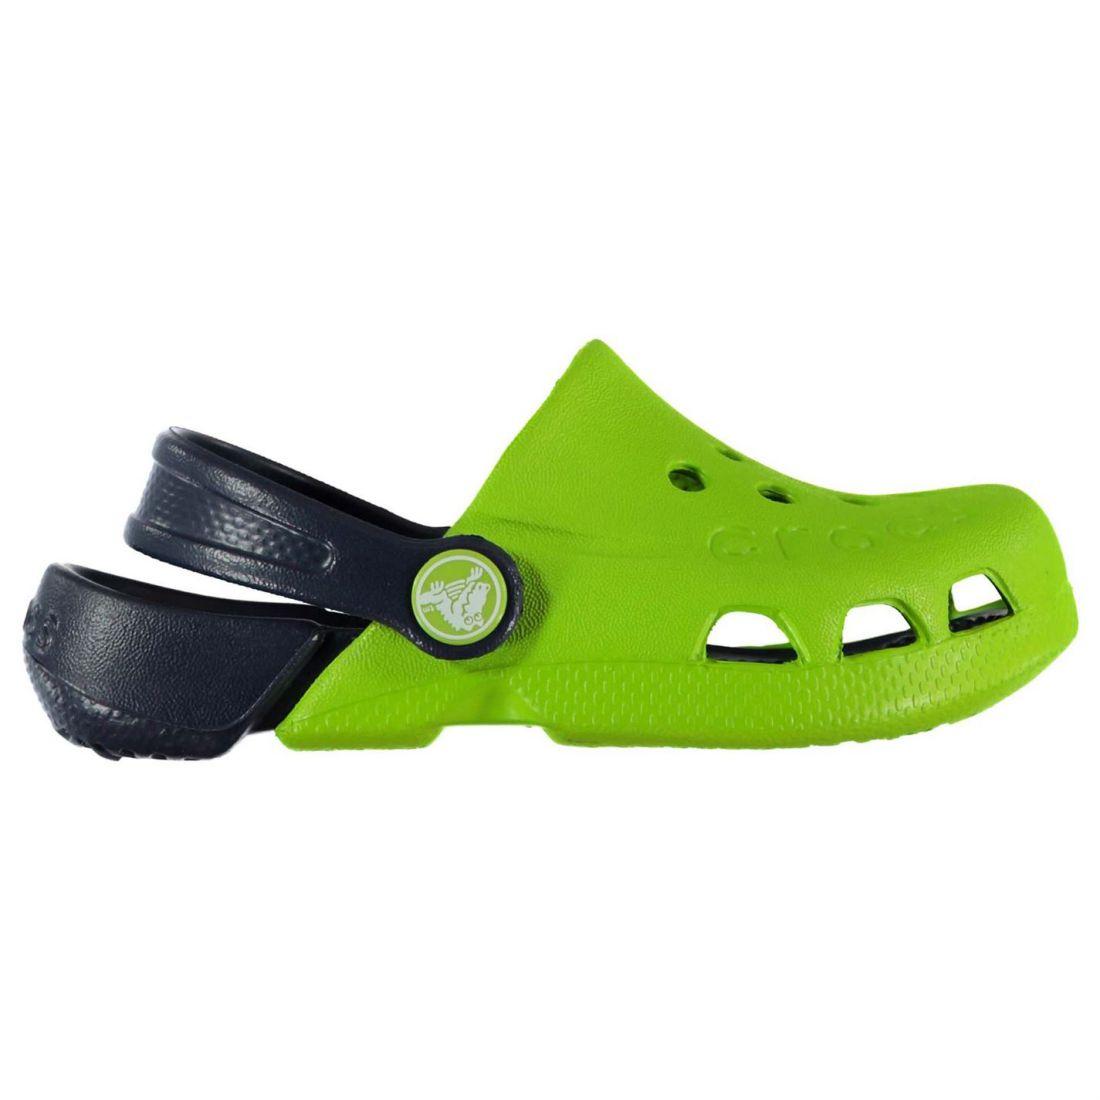 dc24c73fc938 Crocs Baby Electro Clogs Shoes Mules Slippers Sandals Slip On Colour ...